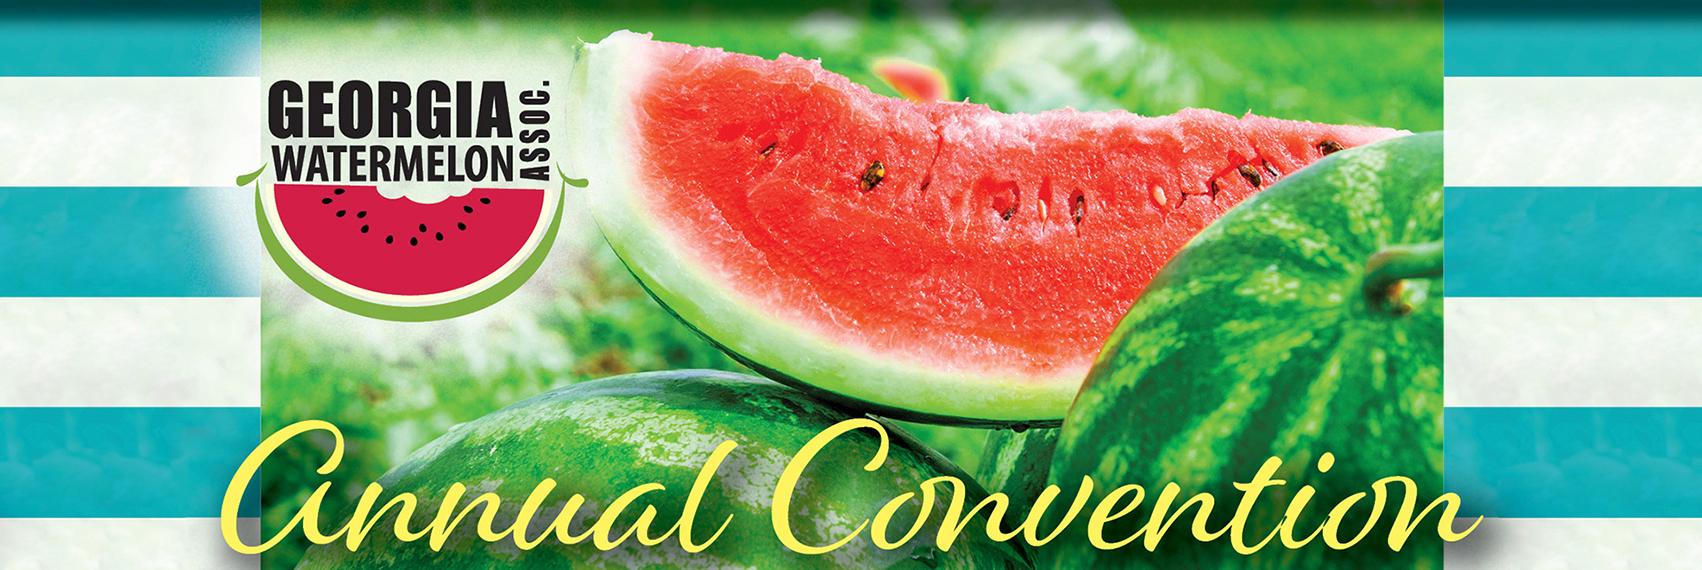 Gwa Confefrence Top 2020